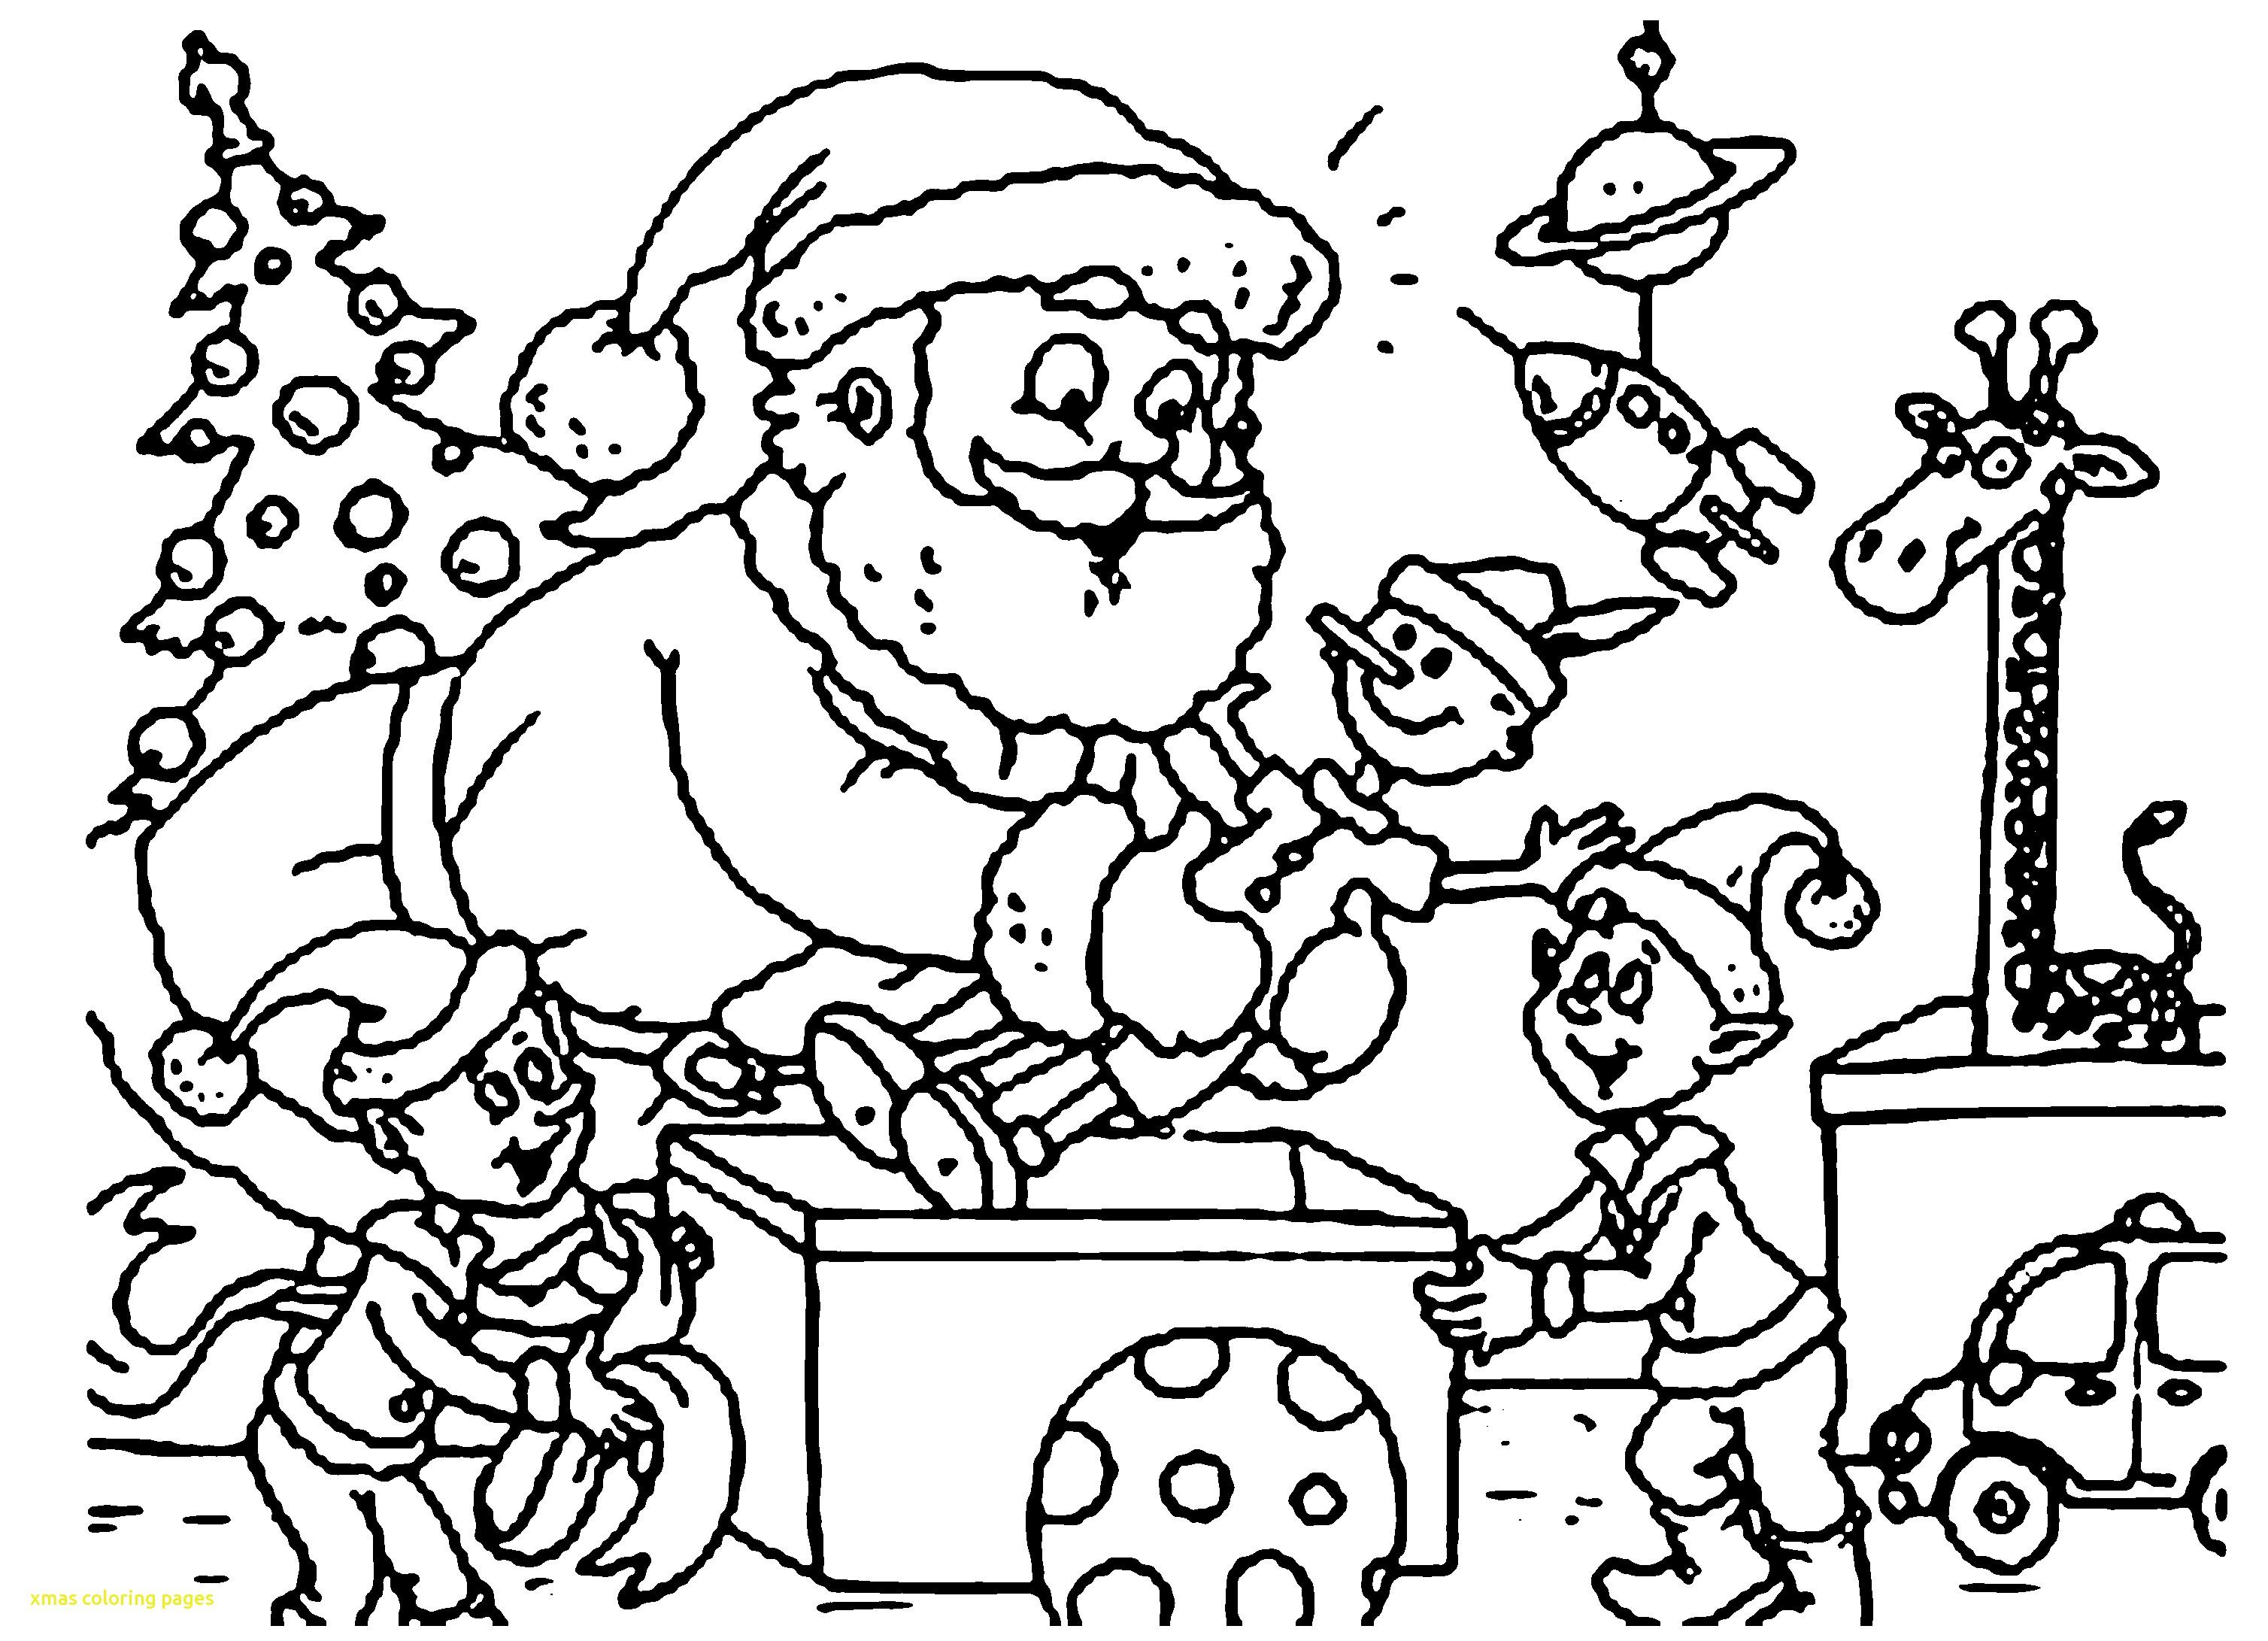 3016x2182 Xmas Coloring Pages With Christmas Free And Gambarmewarnai